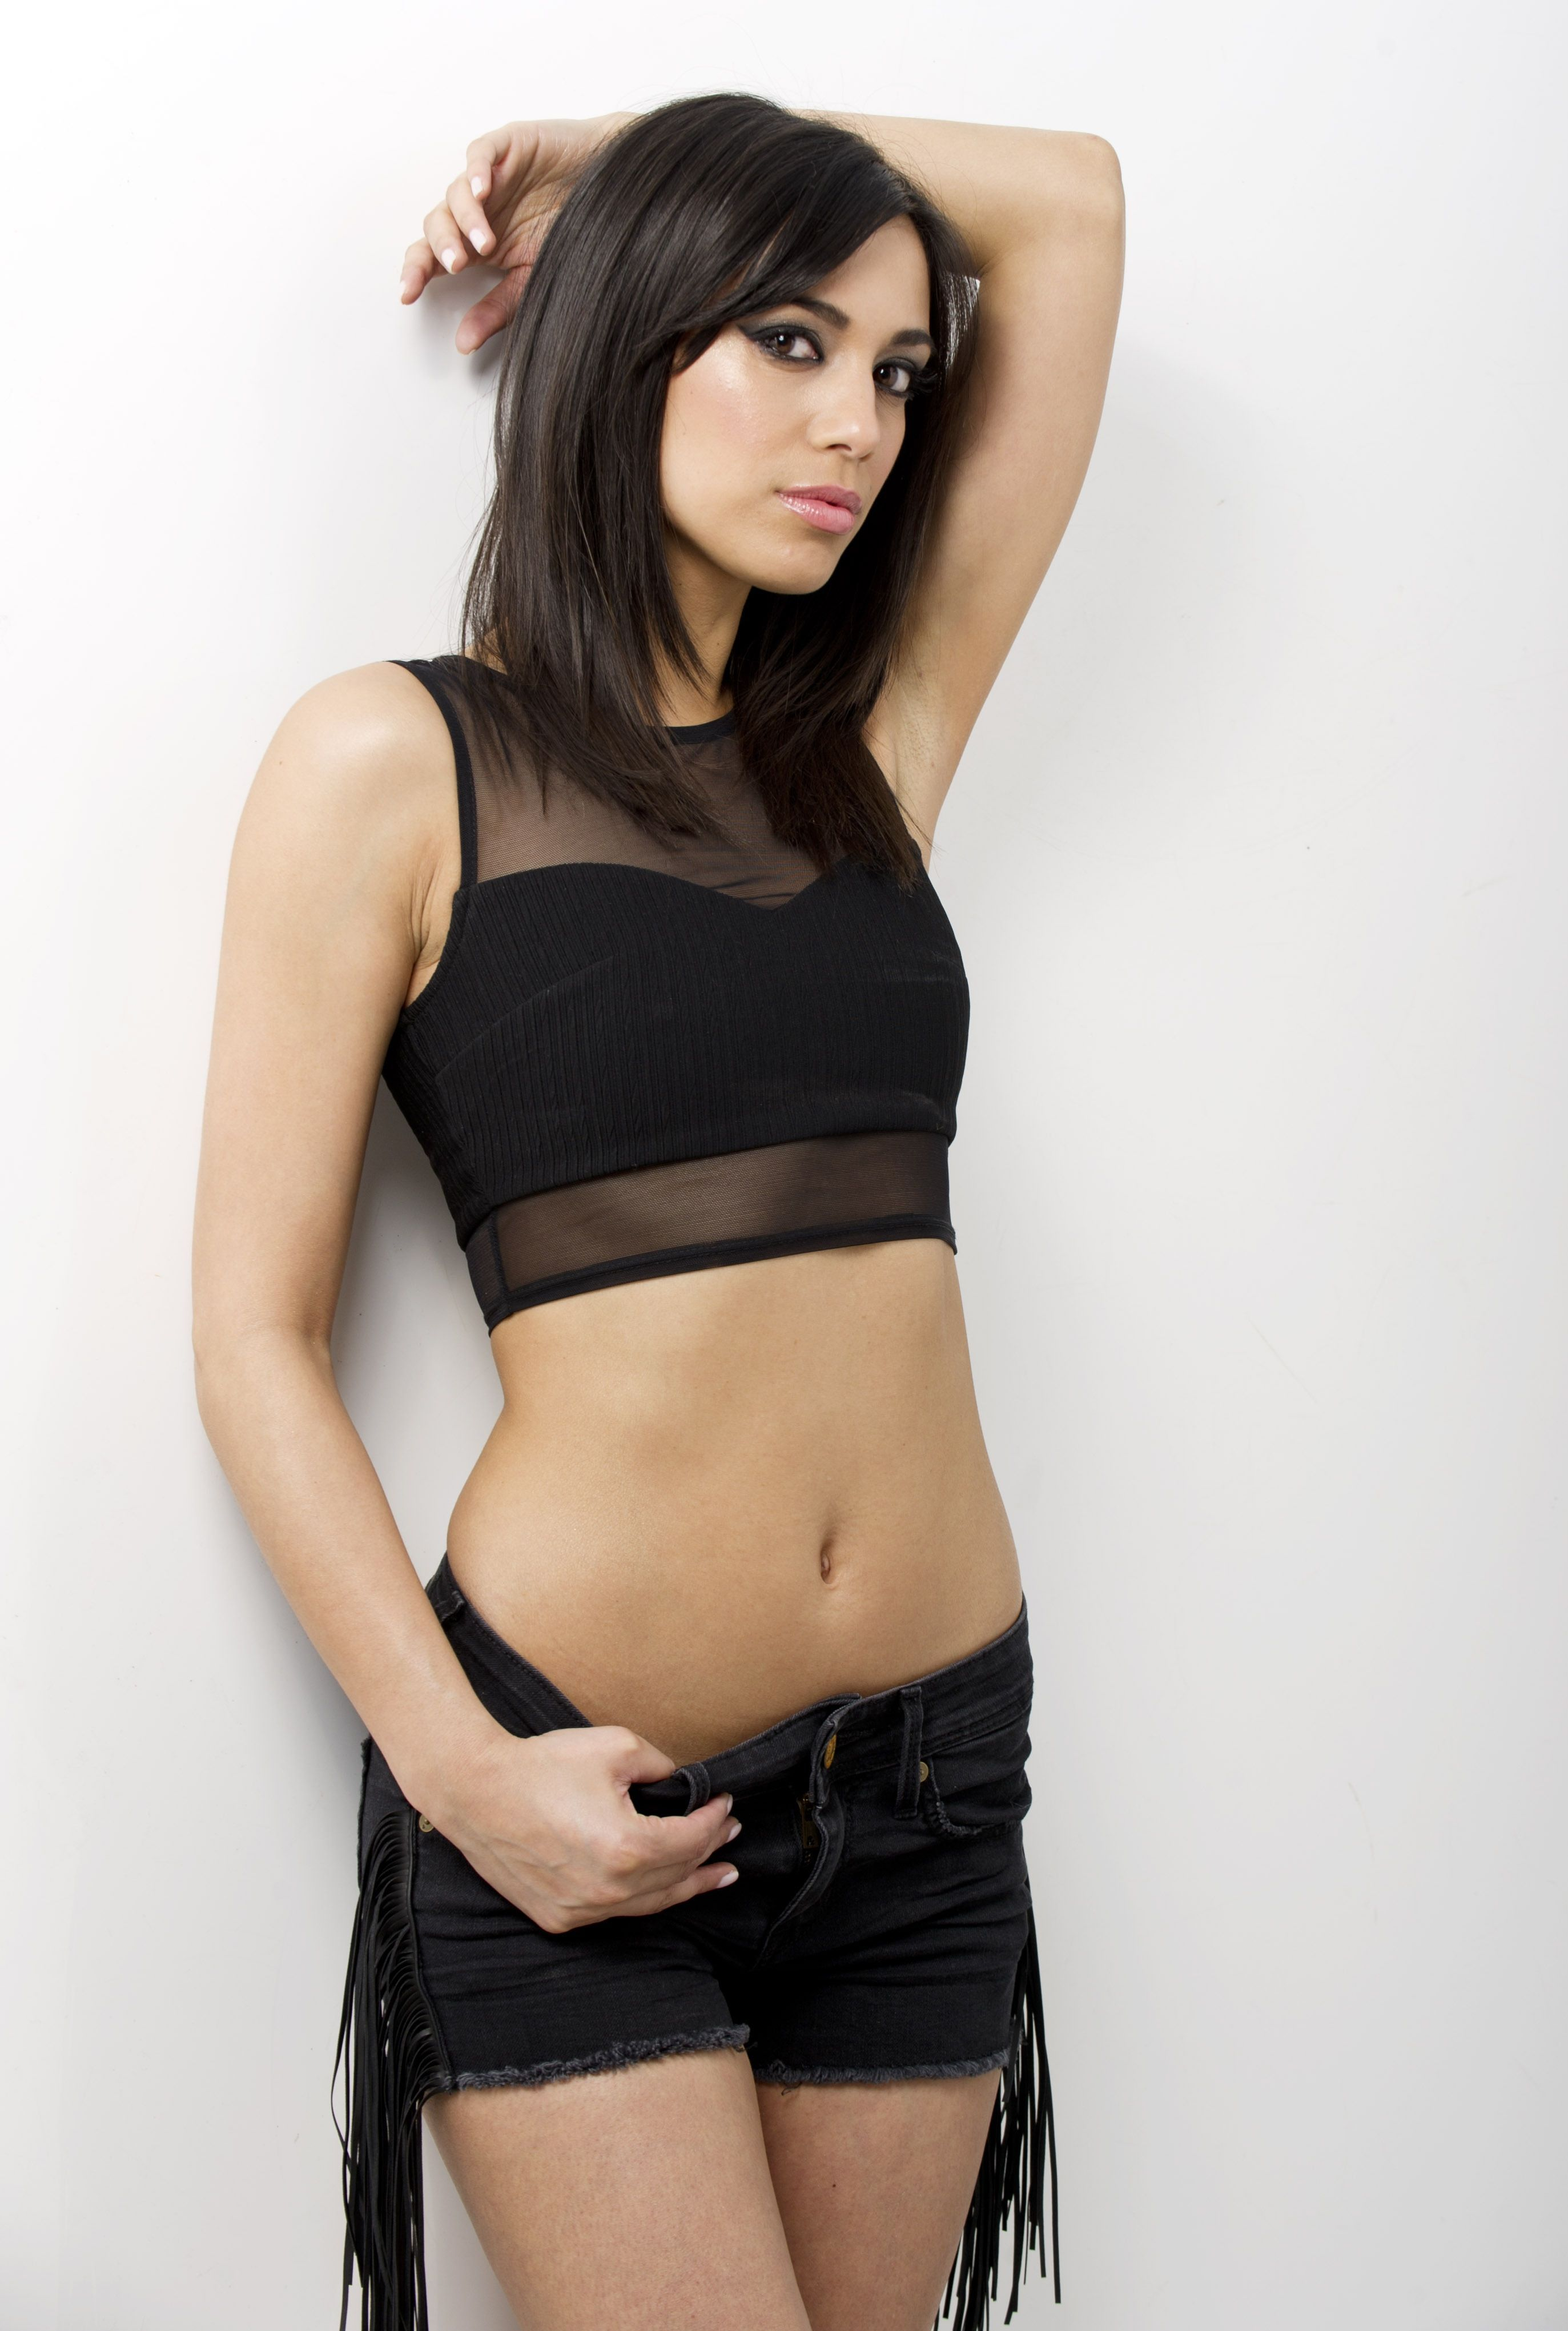 Michelle Hardwick,Mtv mva odds best group video Erotic pics Charlotte mckinney in a lingerie 9 photos,Ashley james pokies